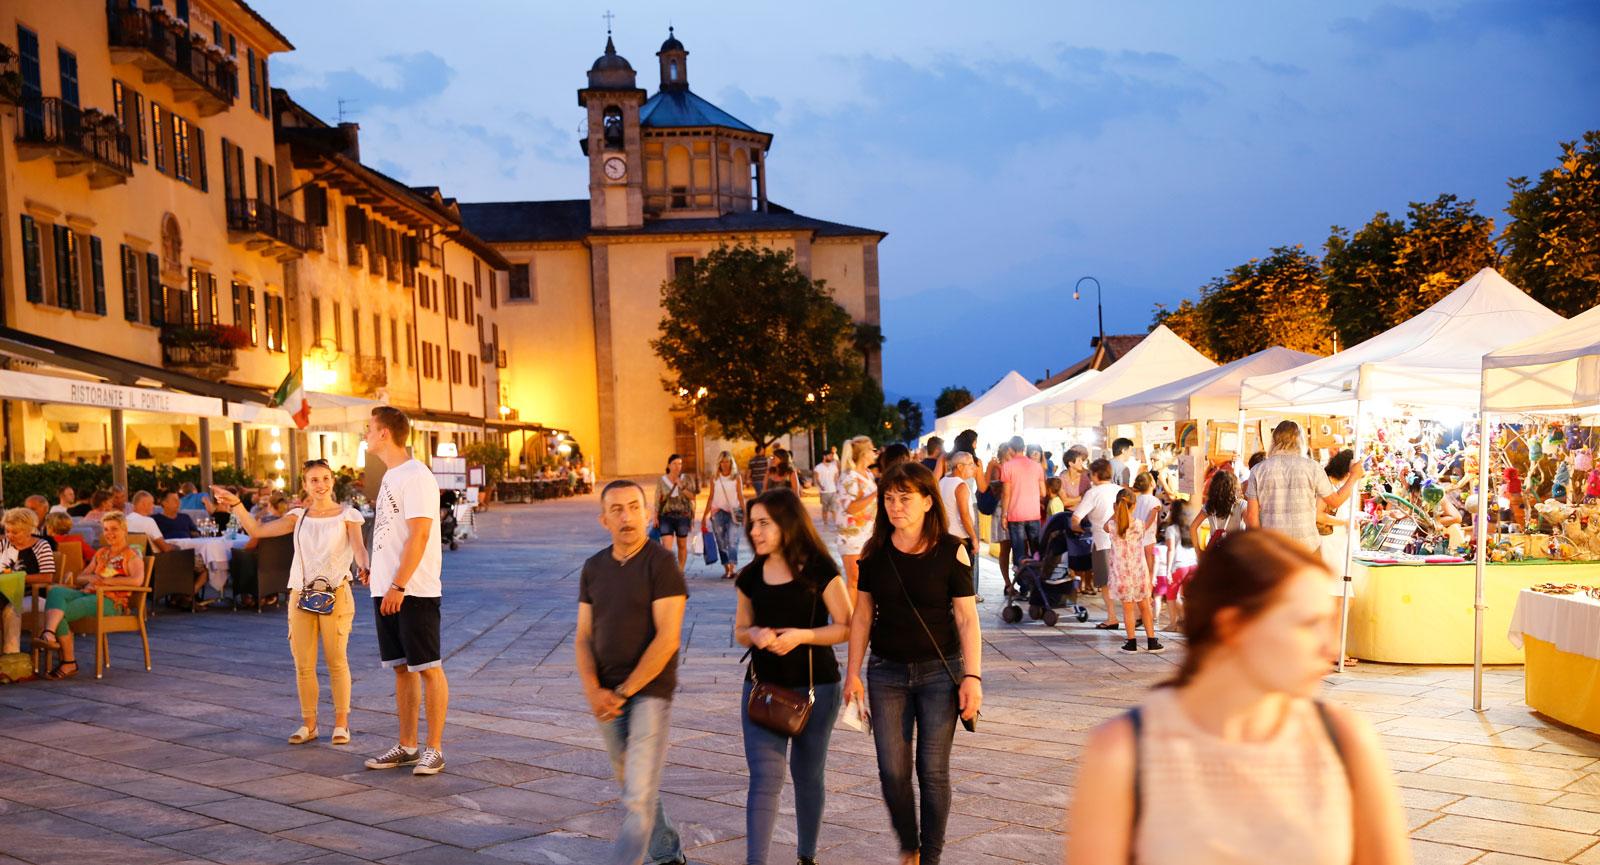 Helgmarknad på Piazzan i Cannobio.